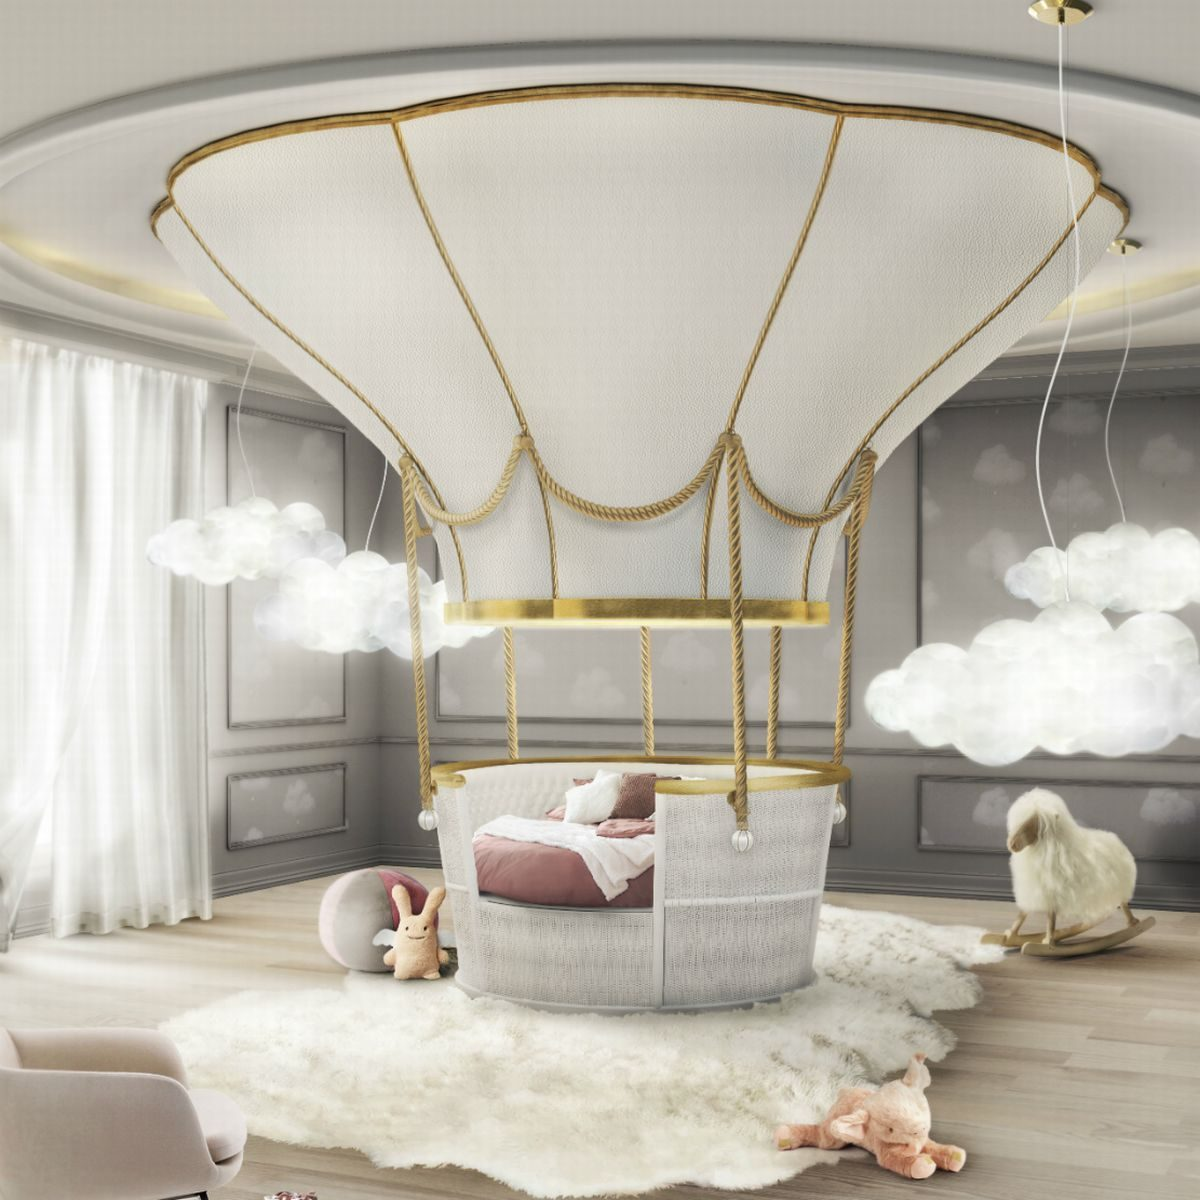 obr.03_babatude-boutiquefantasy-balloon-bed-and-sofa-1200x1200.jpg